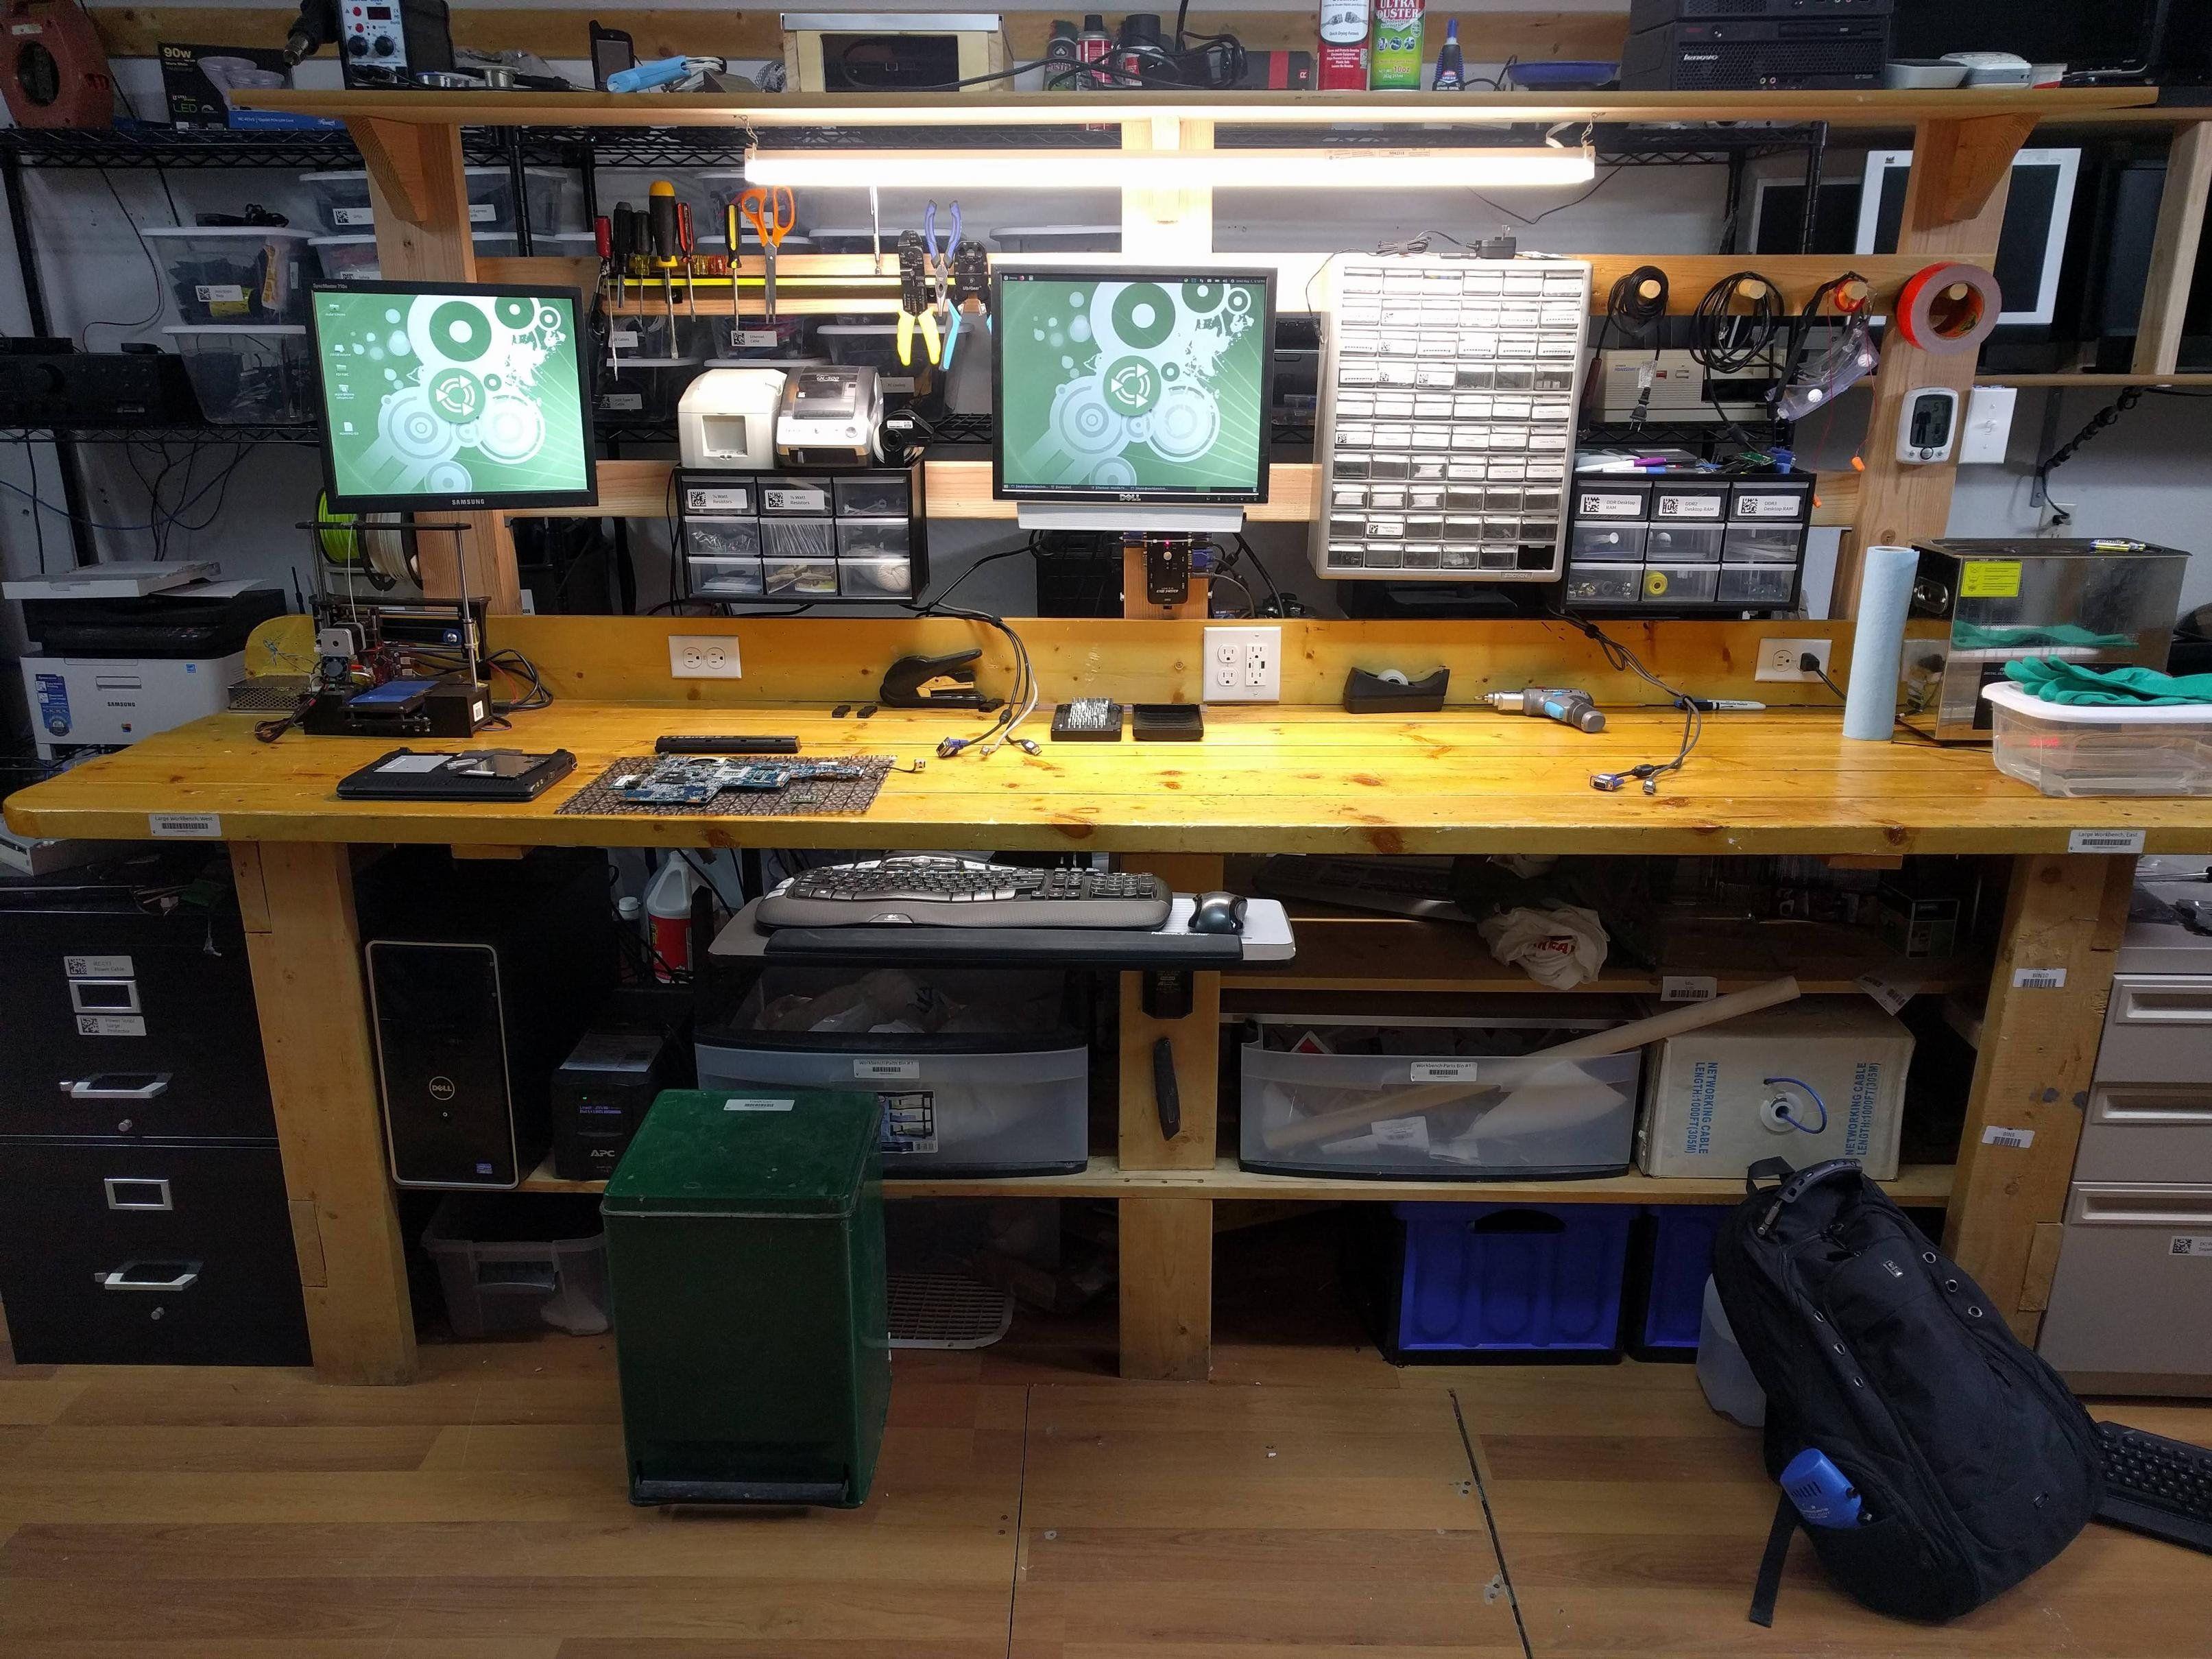 My Computer Repair Workbench Battlestations Computer Repair Workbench Computer Workbench Workbench